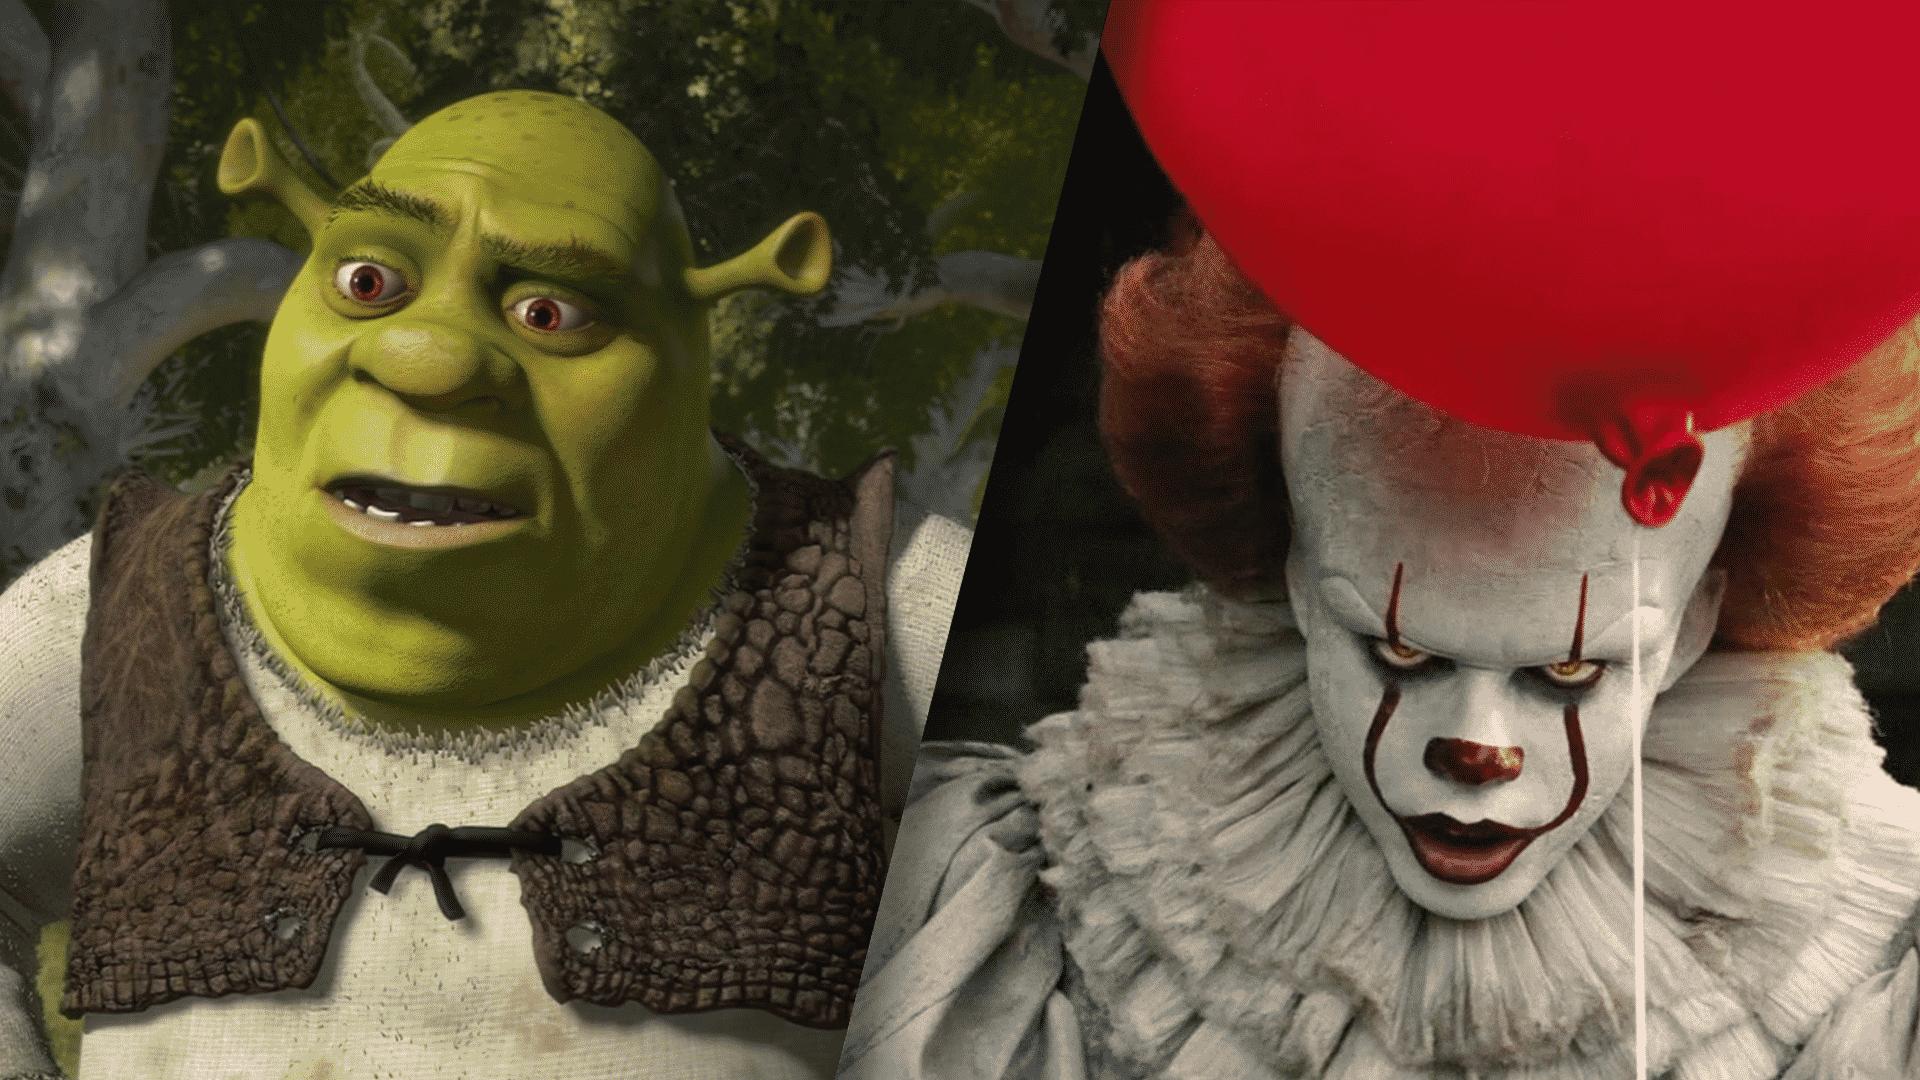 Shrek miesto Pennywisea